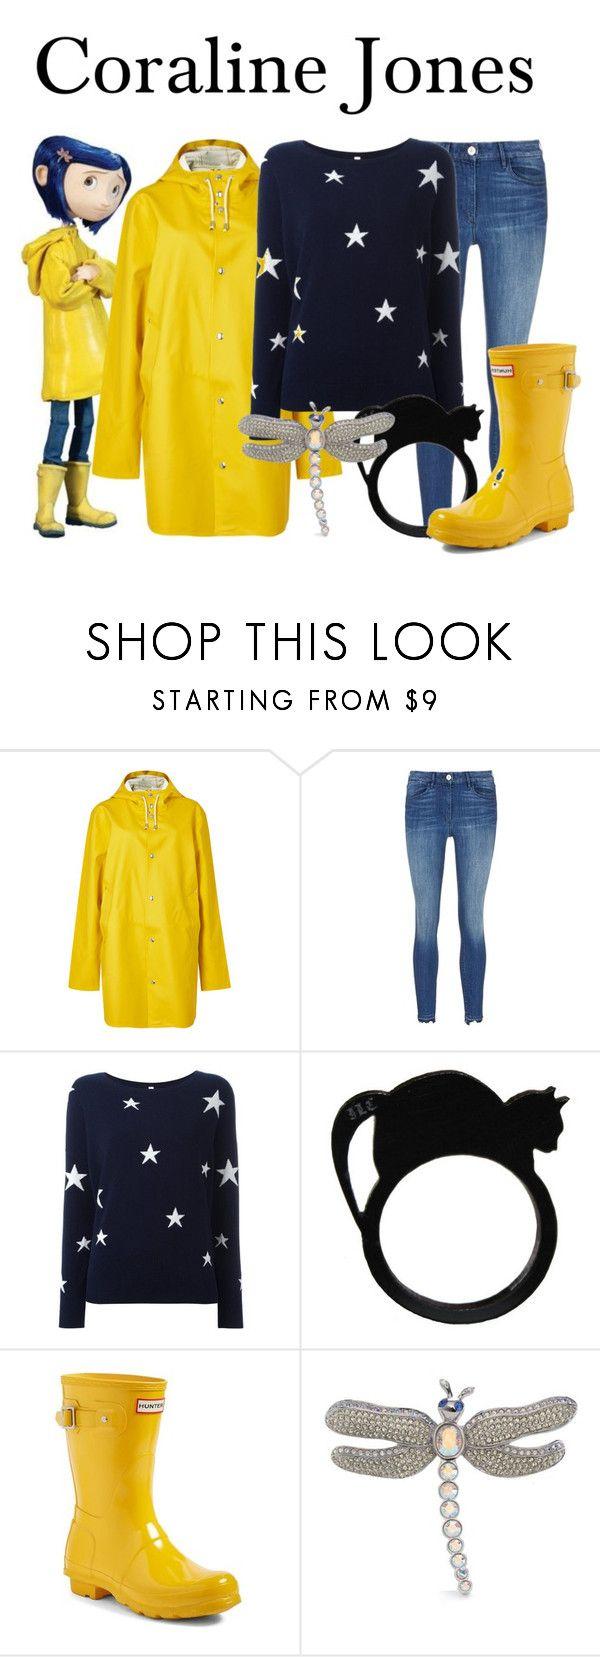 Designer Clothes Shoes Bags For Women Ssense Coraline Jones Coraline Coraline Costume